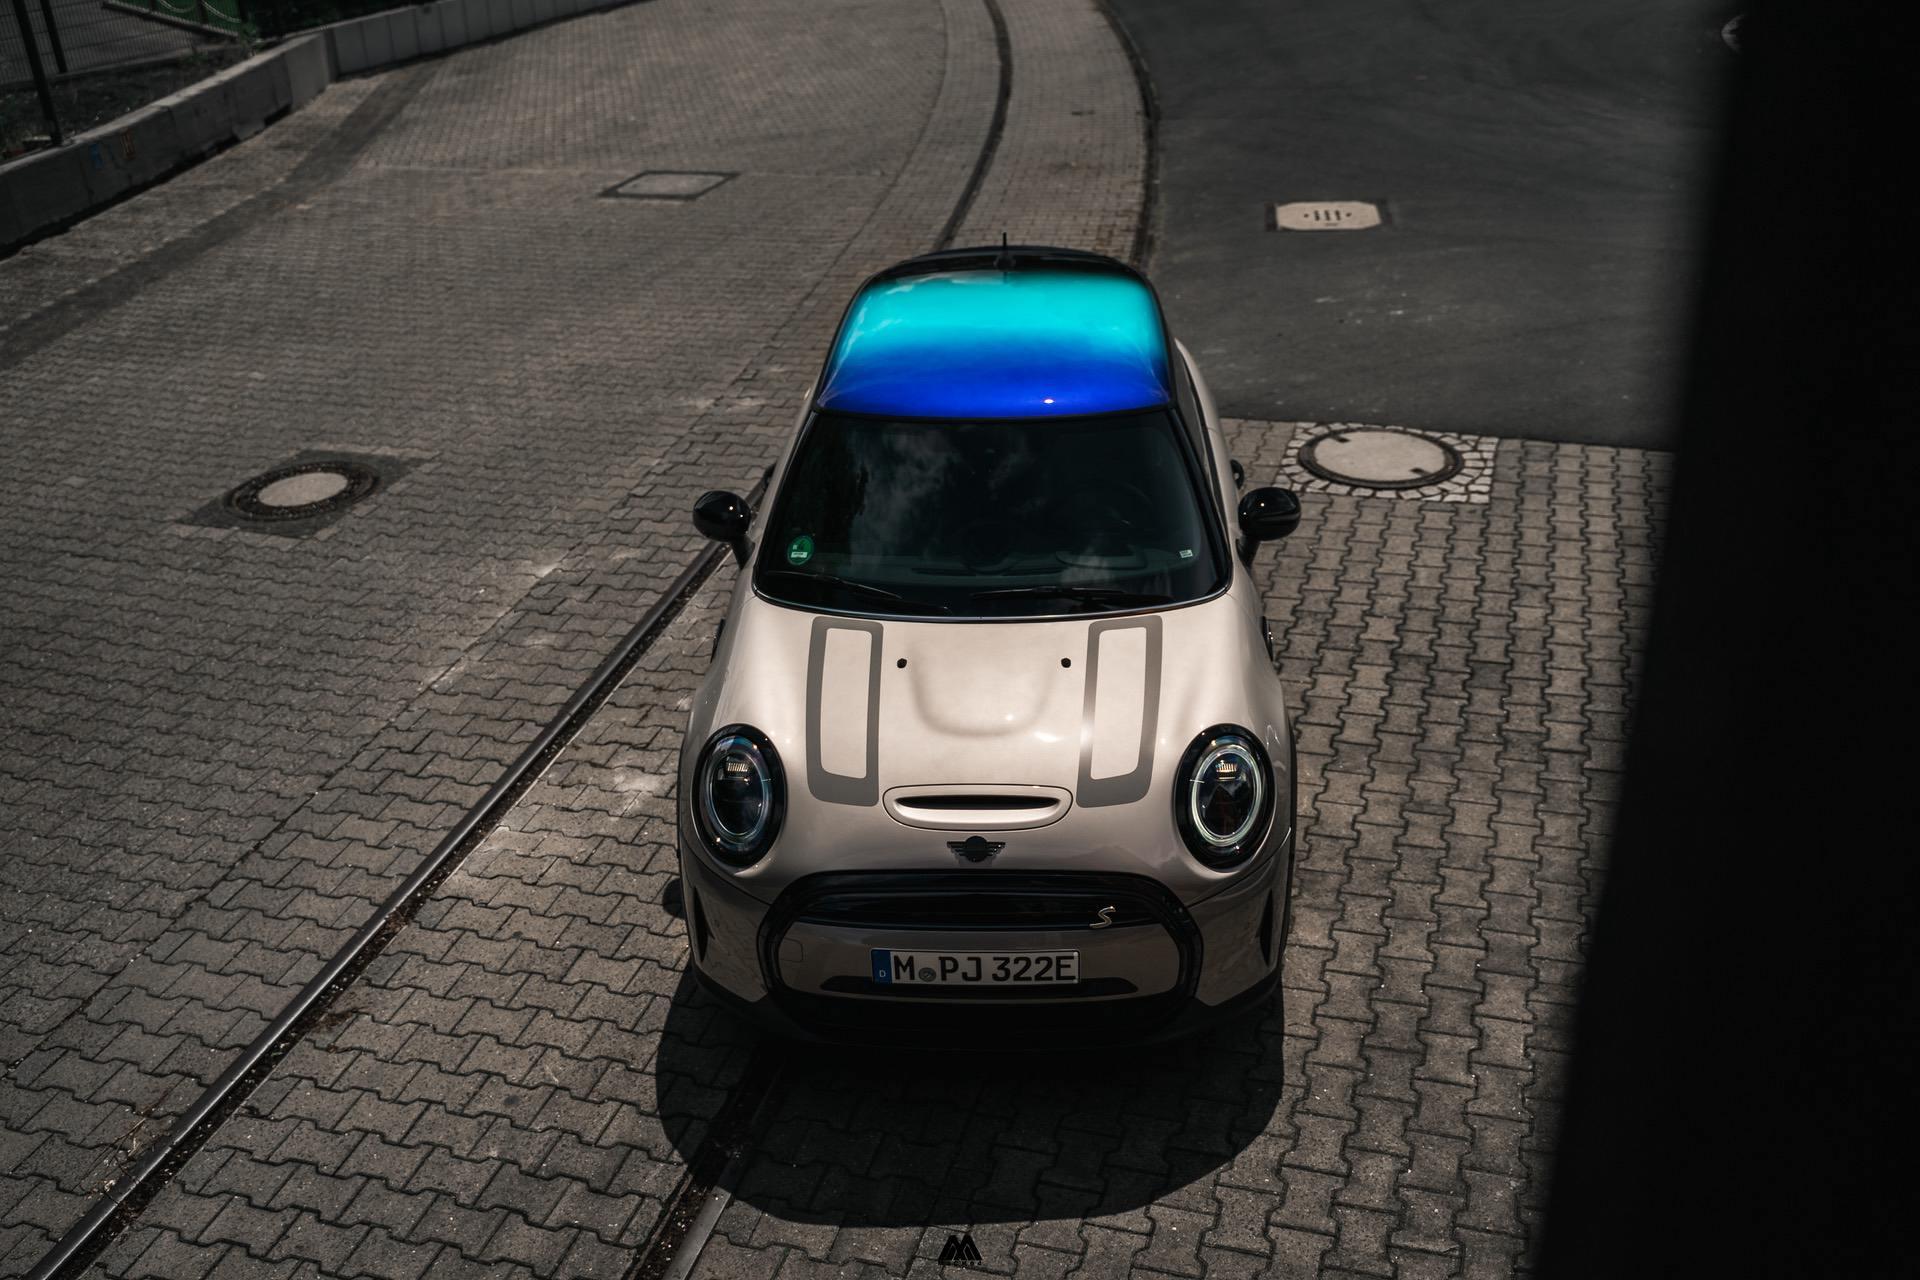 2021 mini cooper se Ev test Drive 22